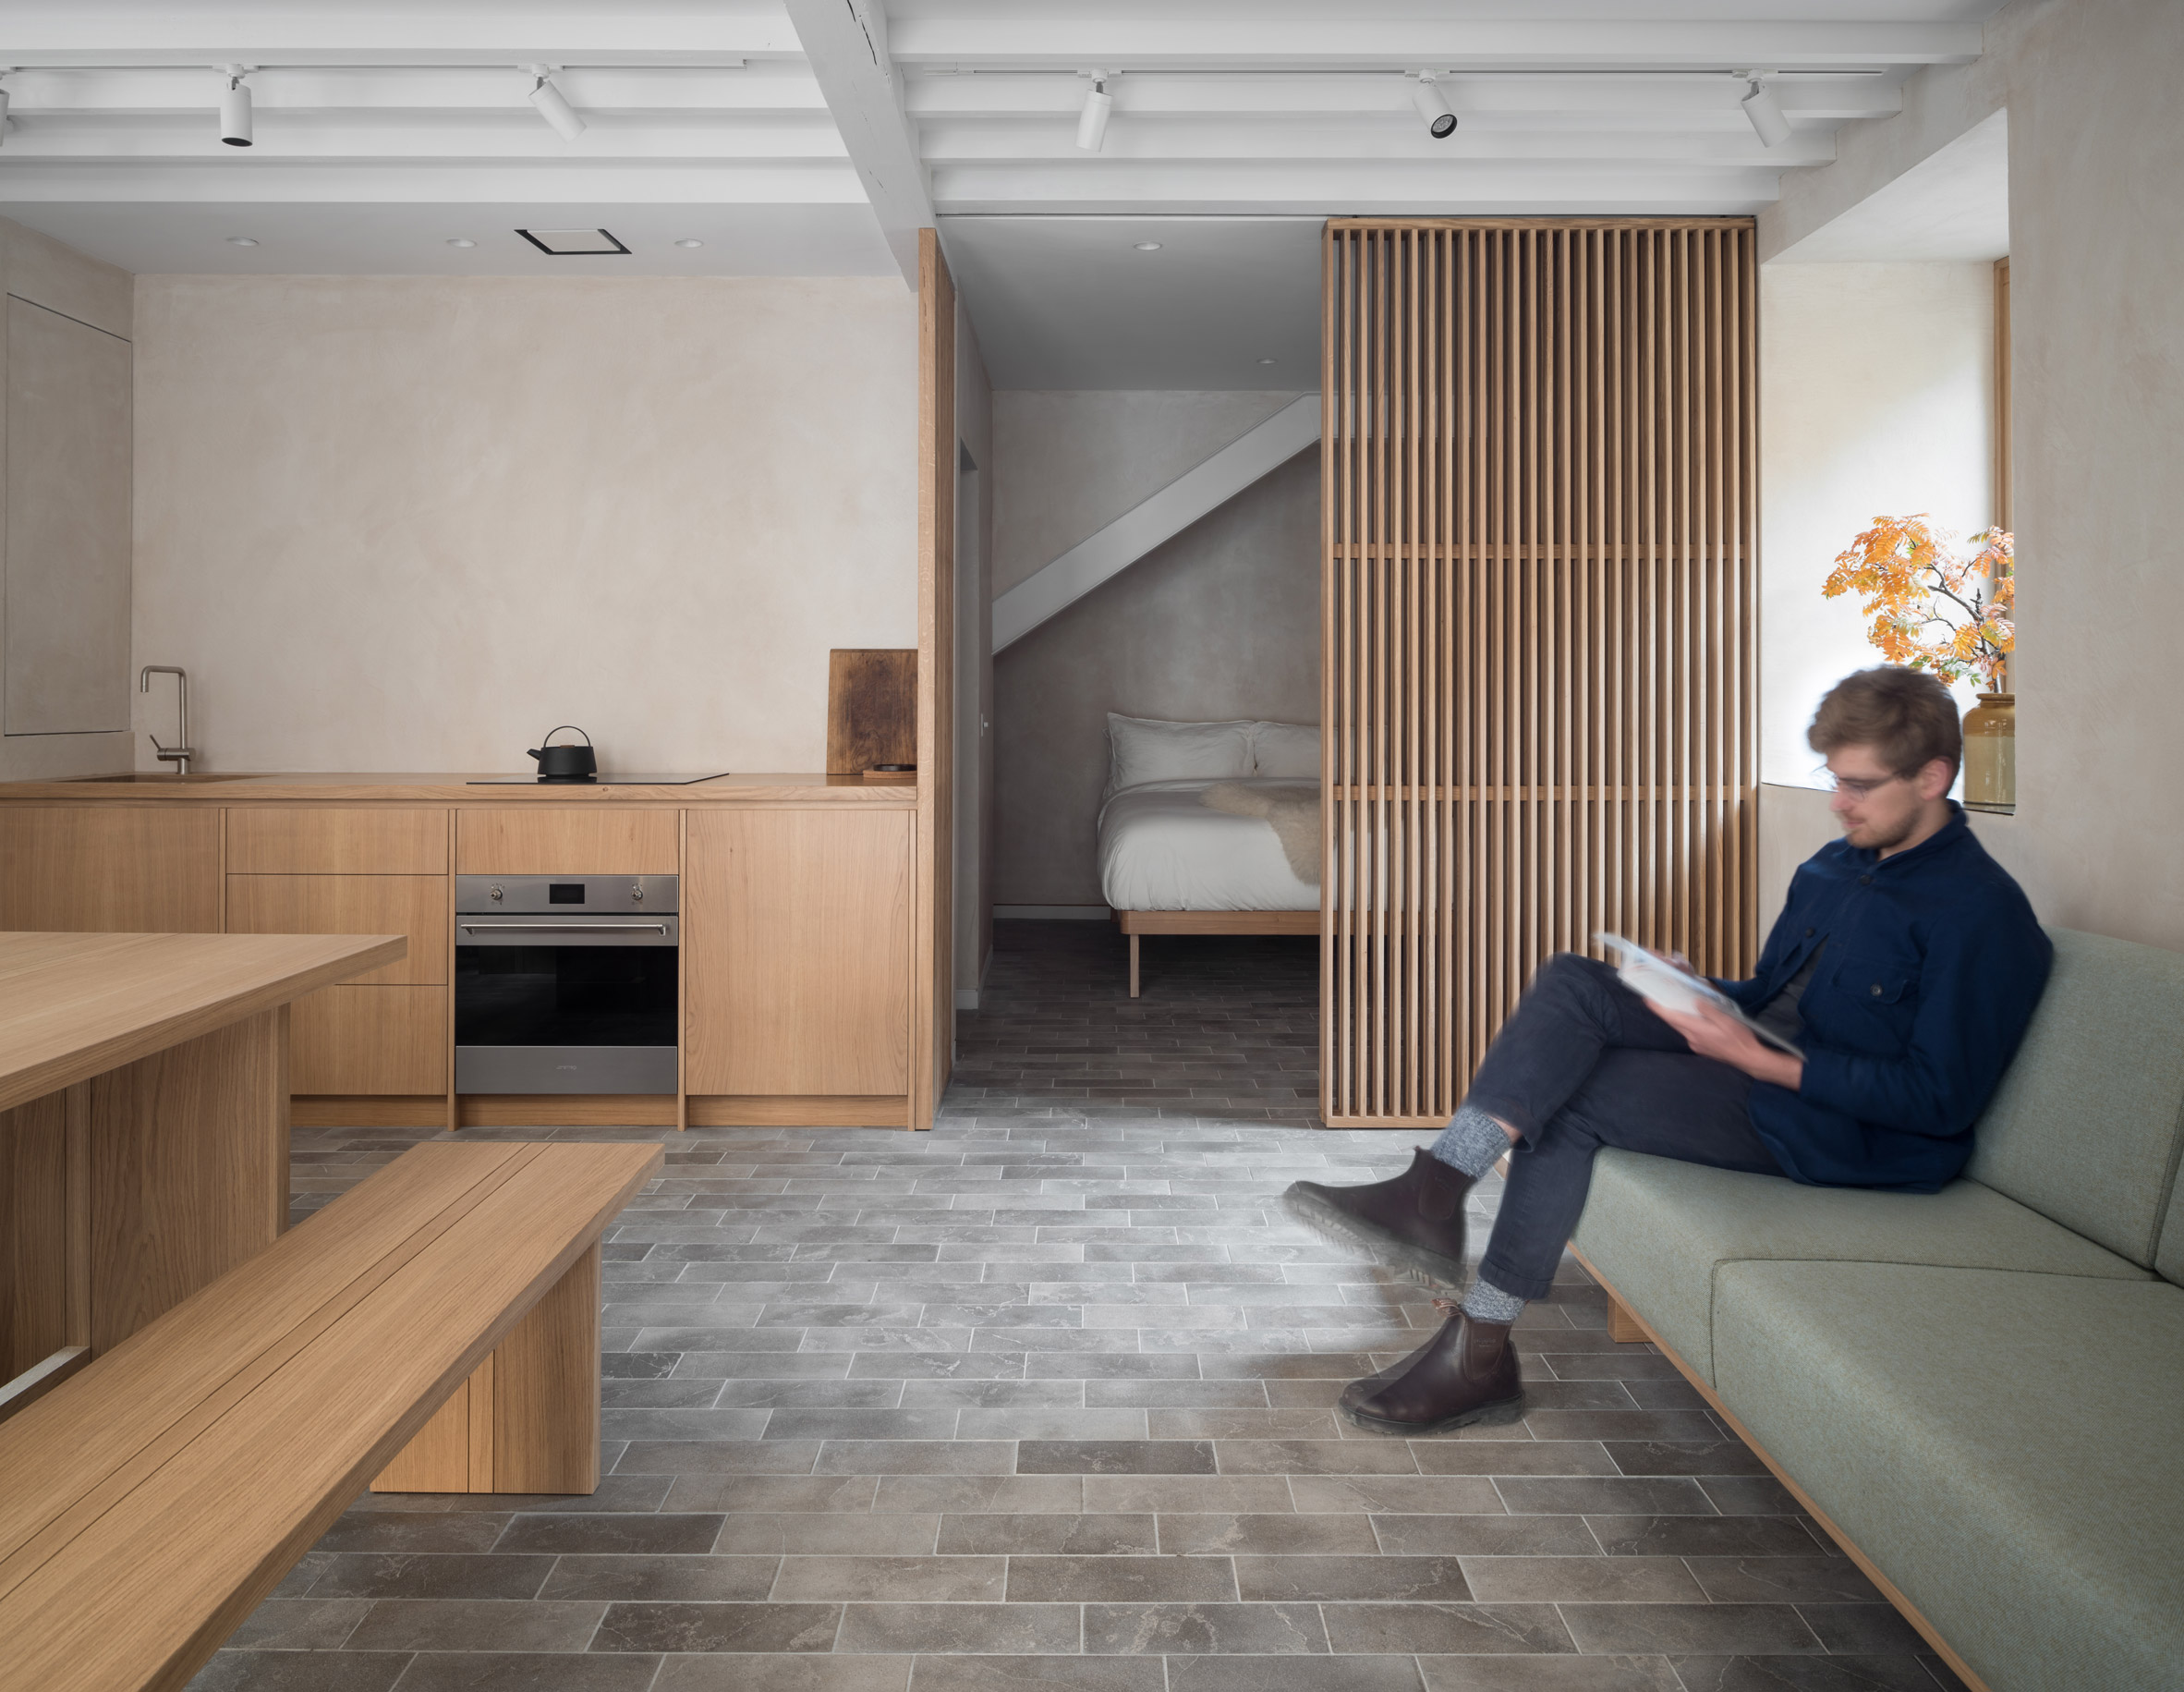 Old Edinburgh workshop transformed into minimal holiday retreat by Izat Arundell